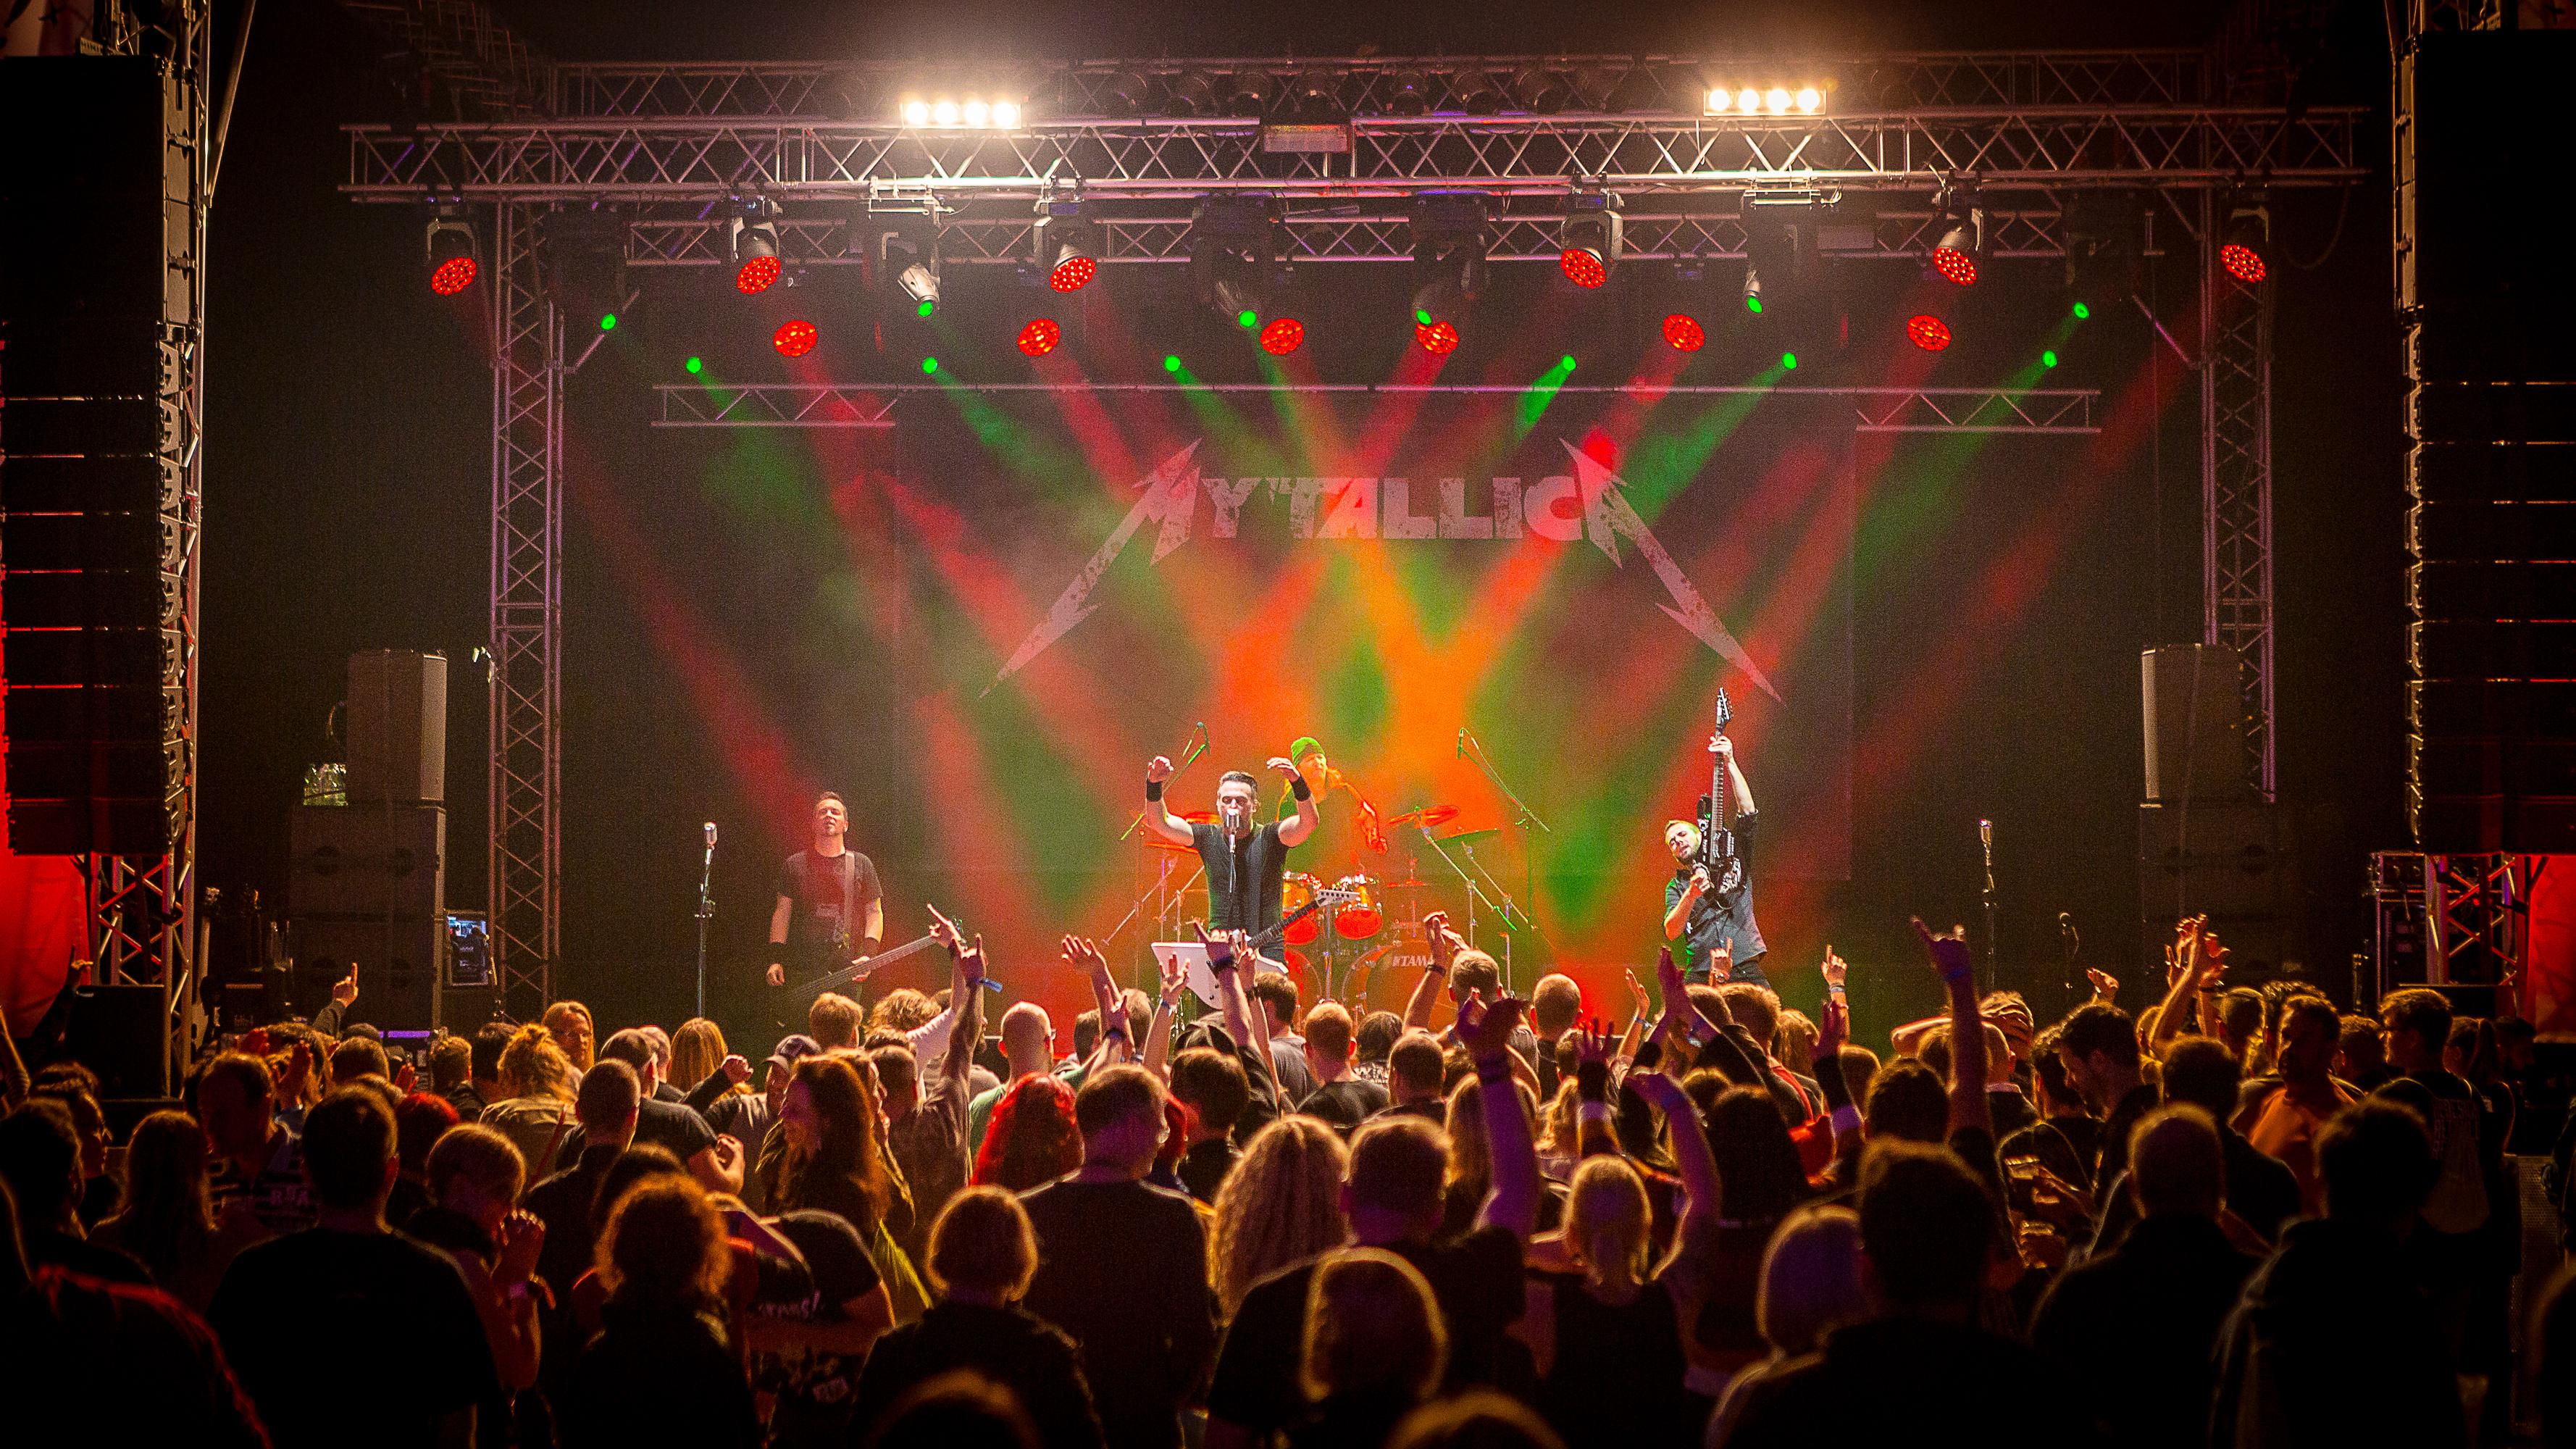 Metallica-Coverband-MYTALLICA-Tribute-Band-Warendorf-iFan-Musikfestival-2017-Tilo-Klein-Bühne-HI-RES